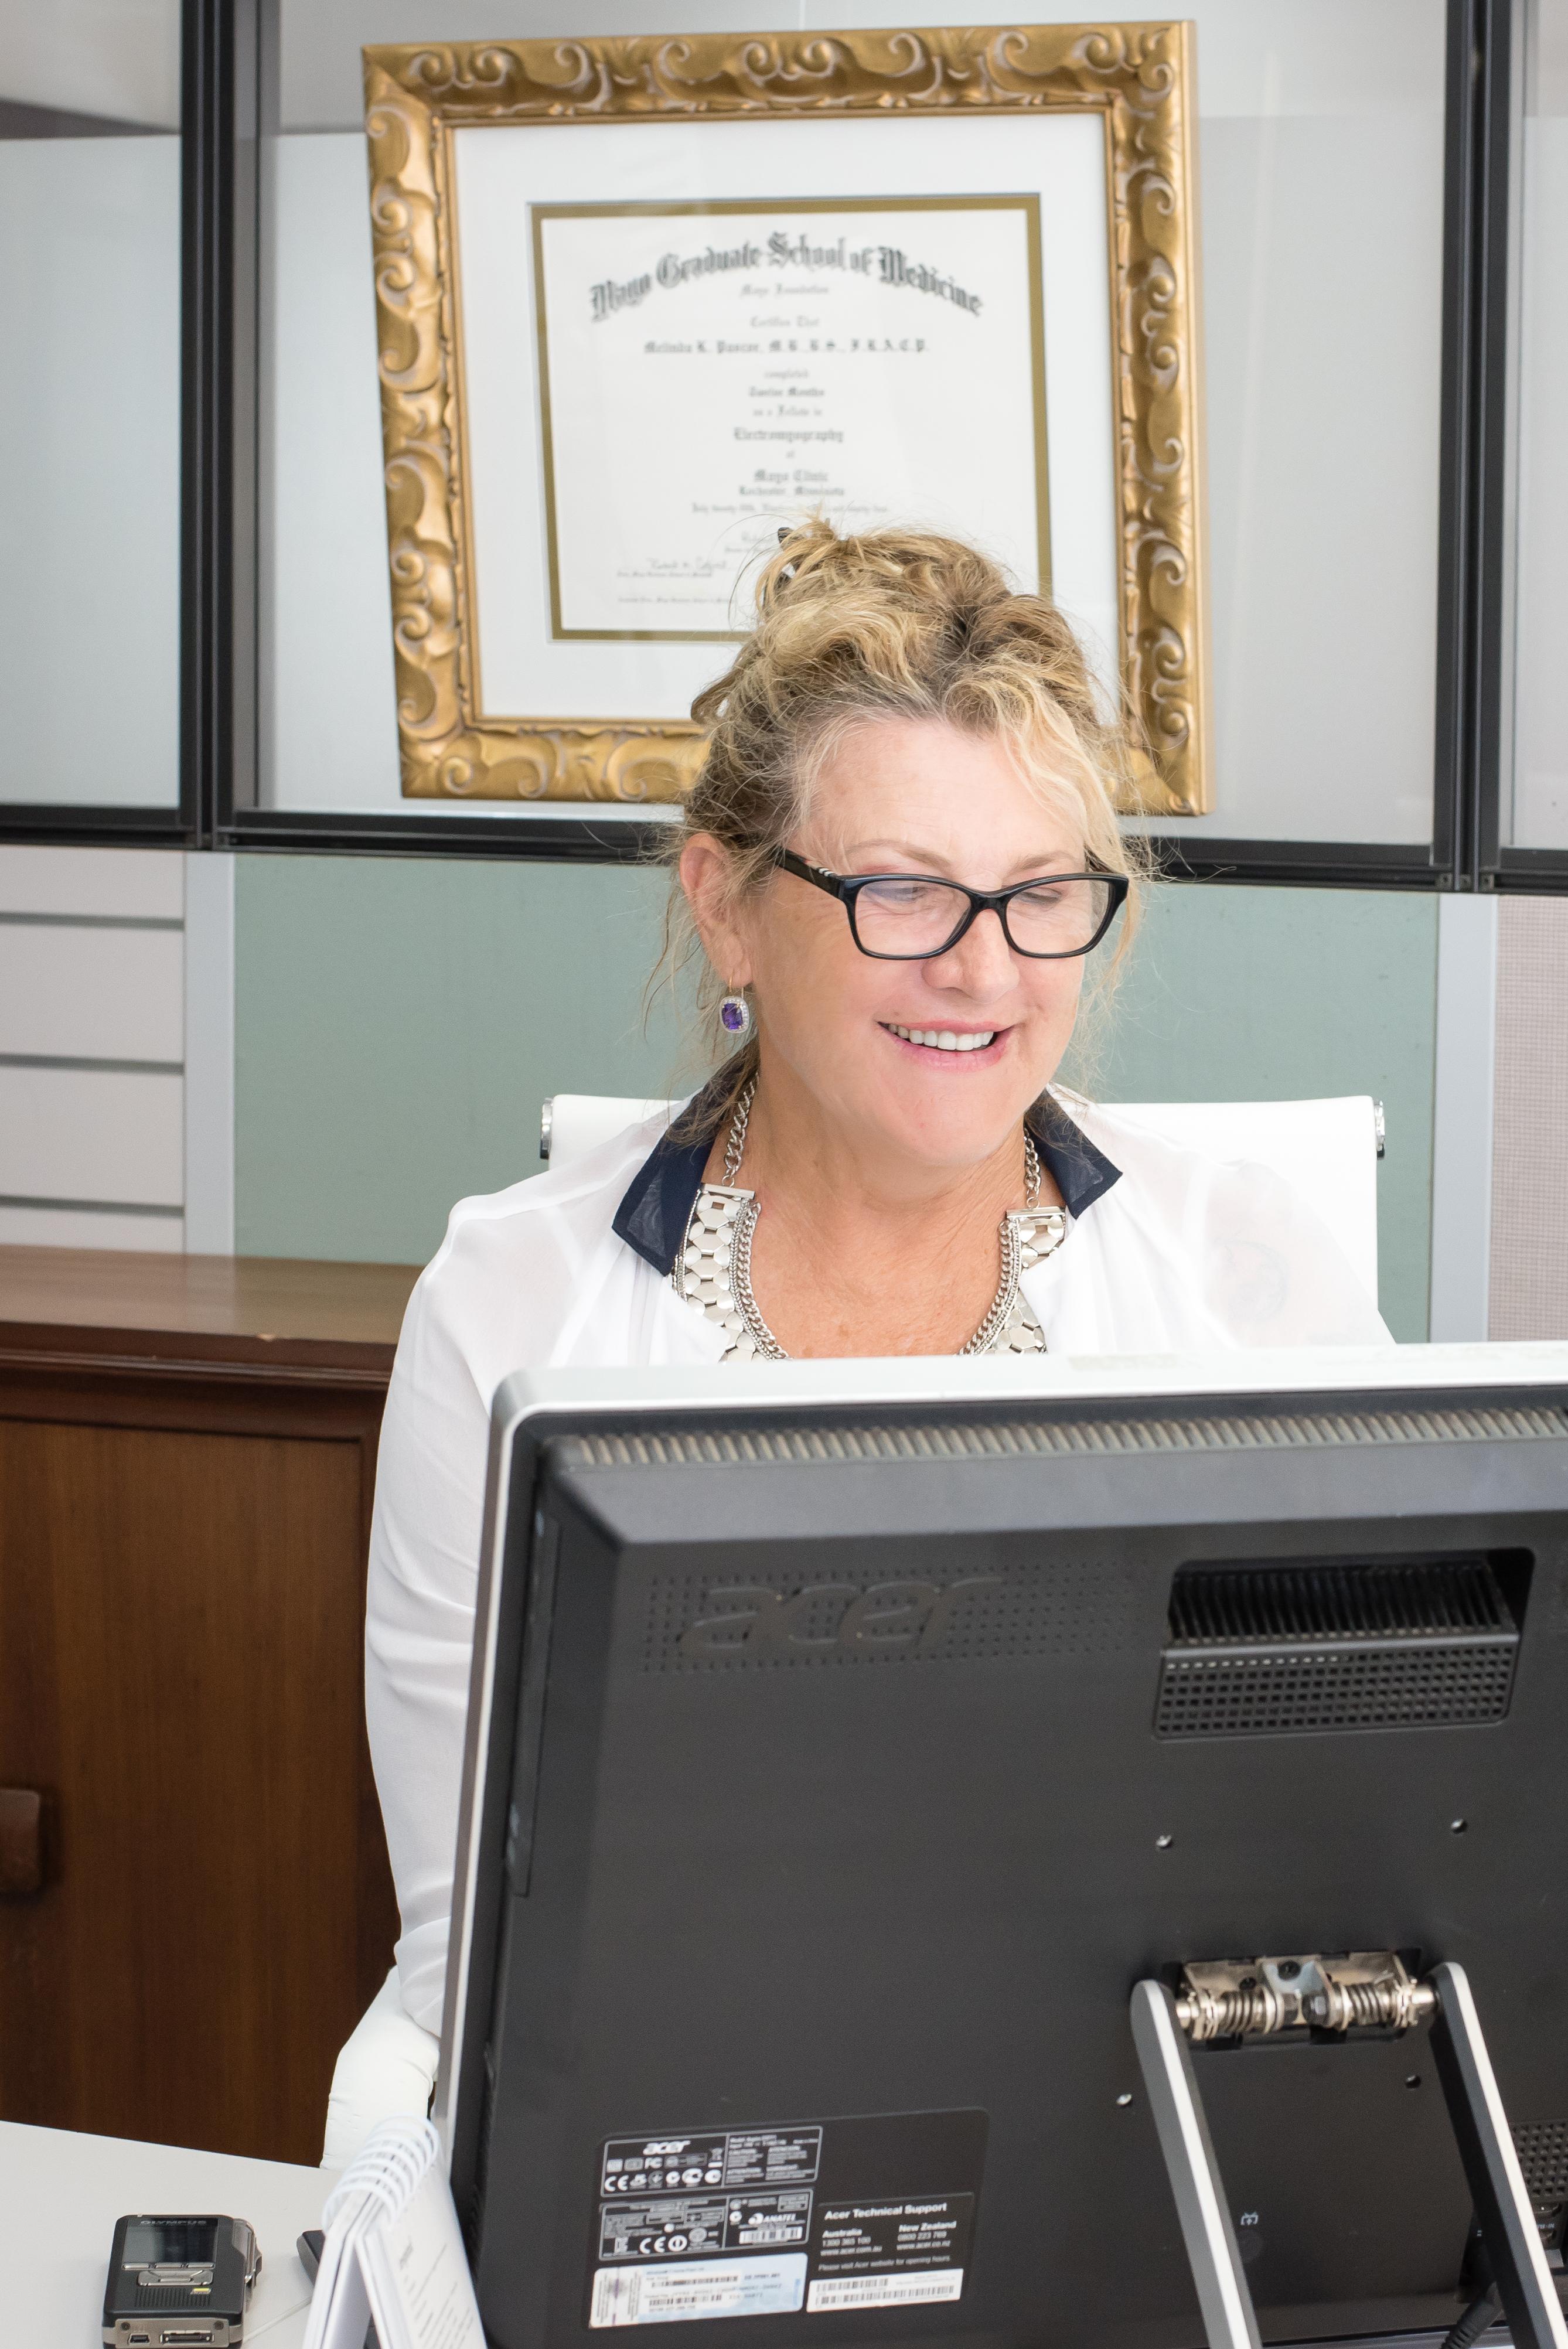 Neurologist Brisbane/Gold Coast EMGs EEGs & Neurological